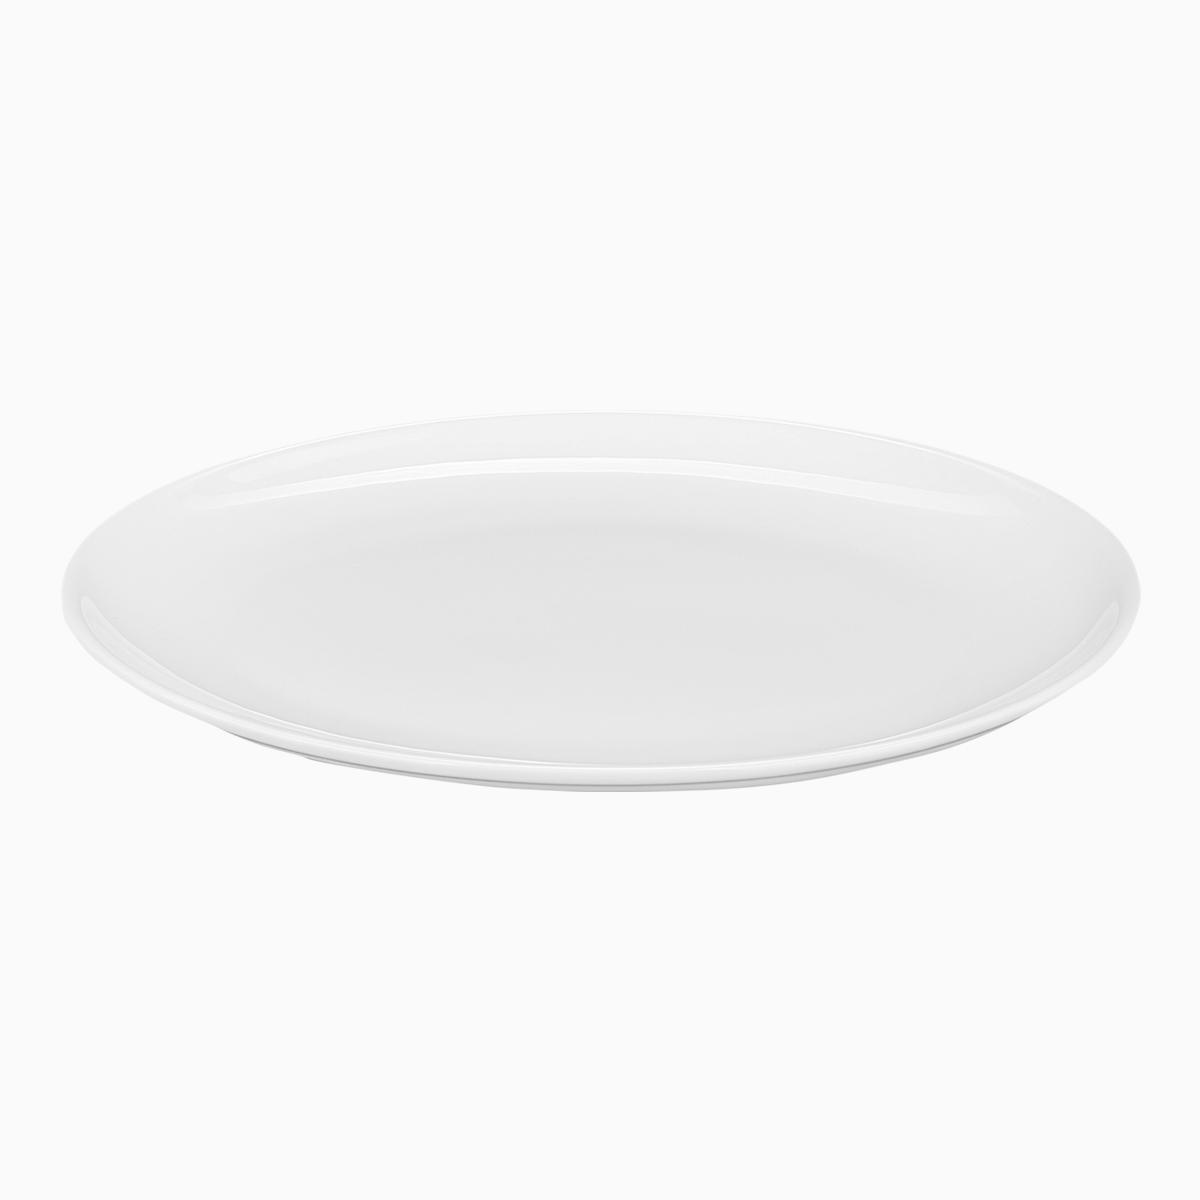 Oválny tanier